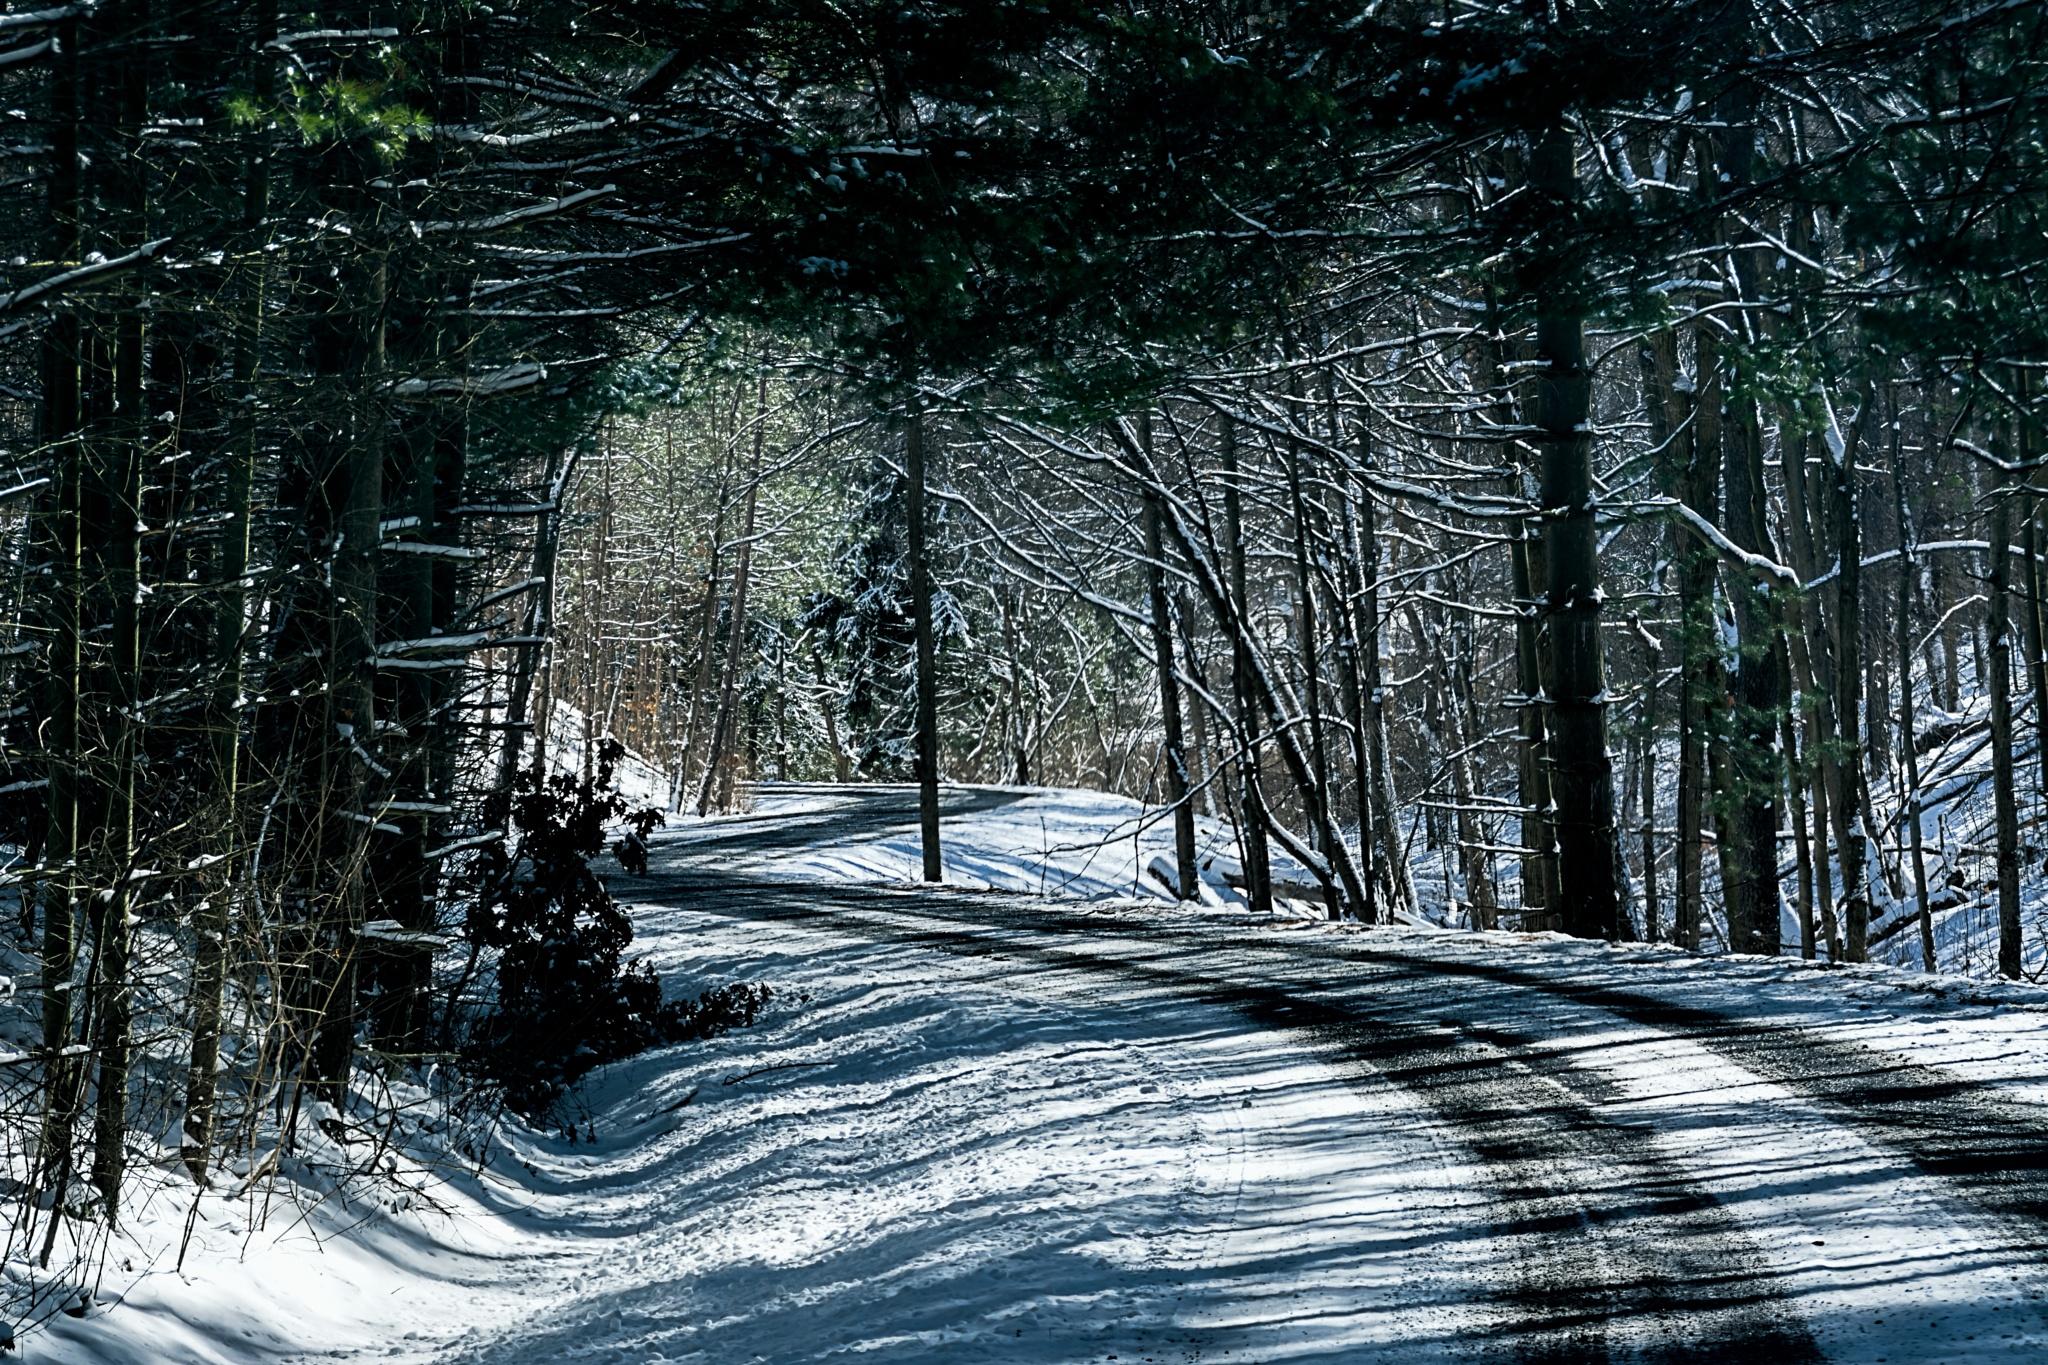 Snowy Road by 68steelphotos